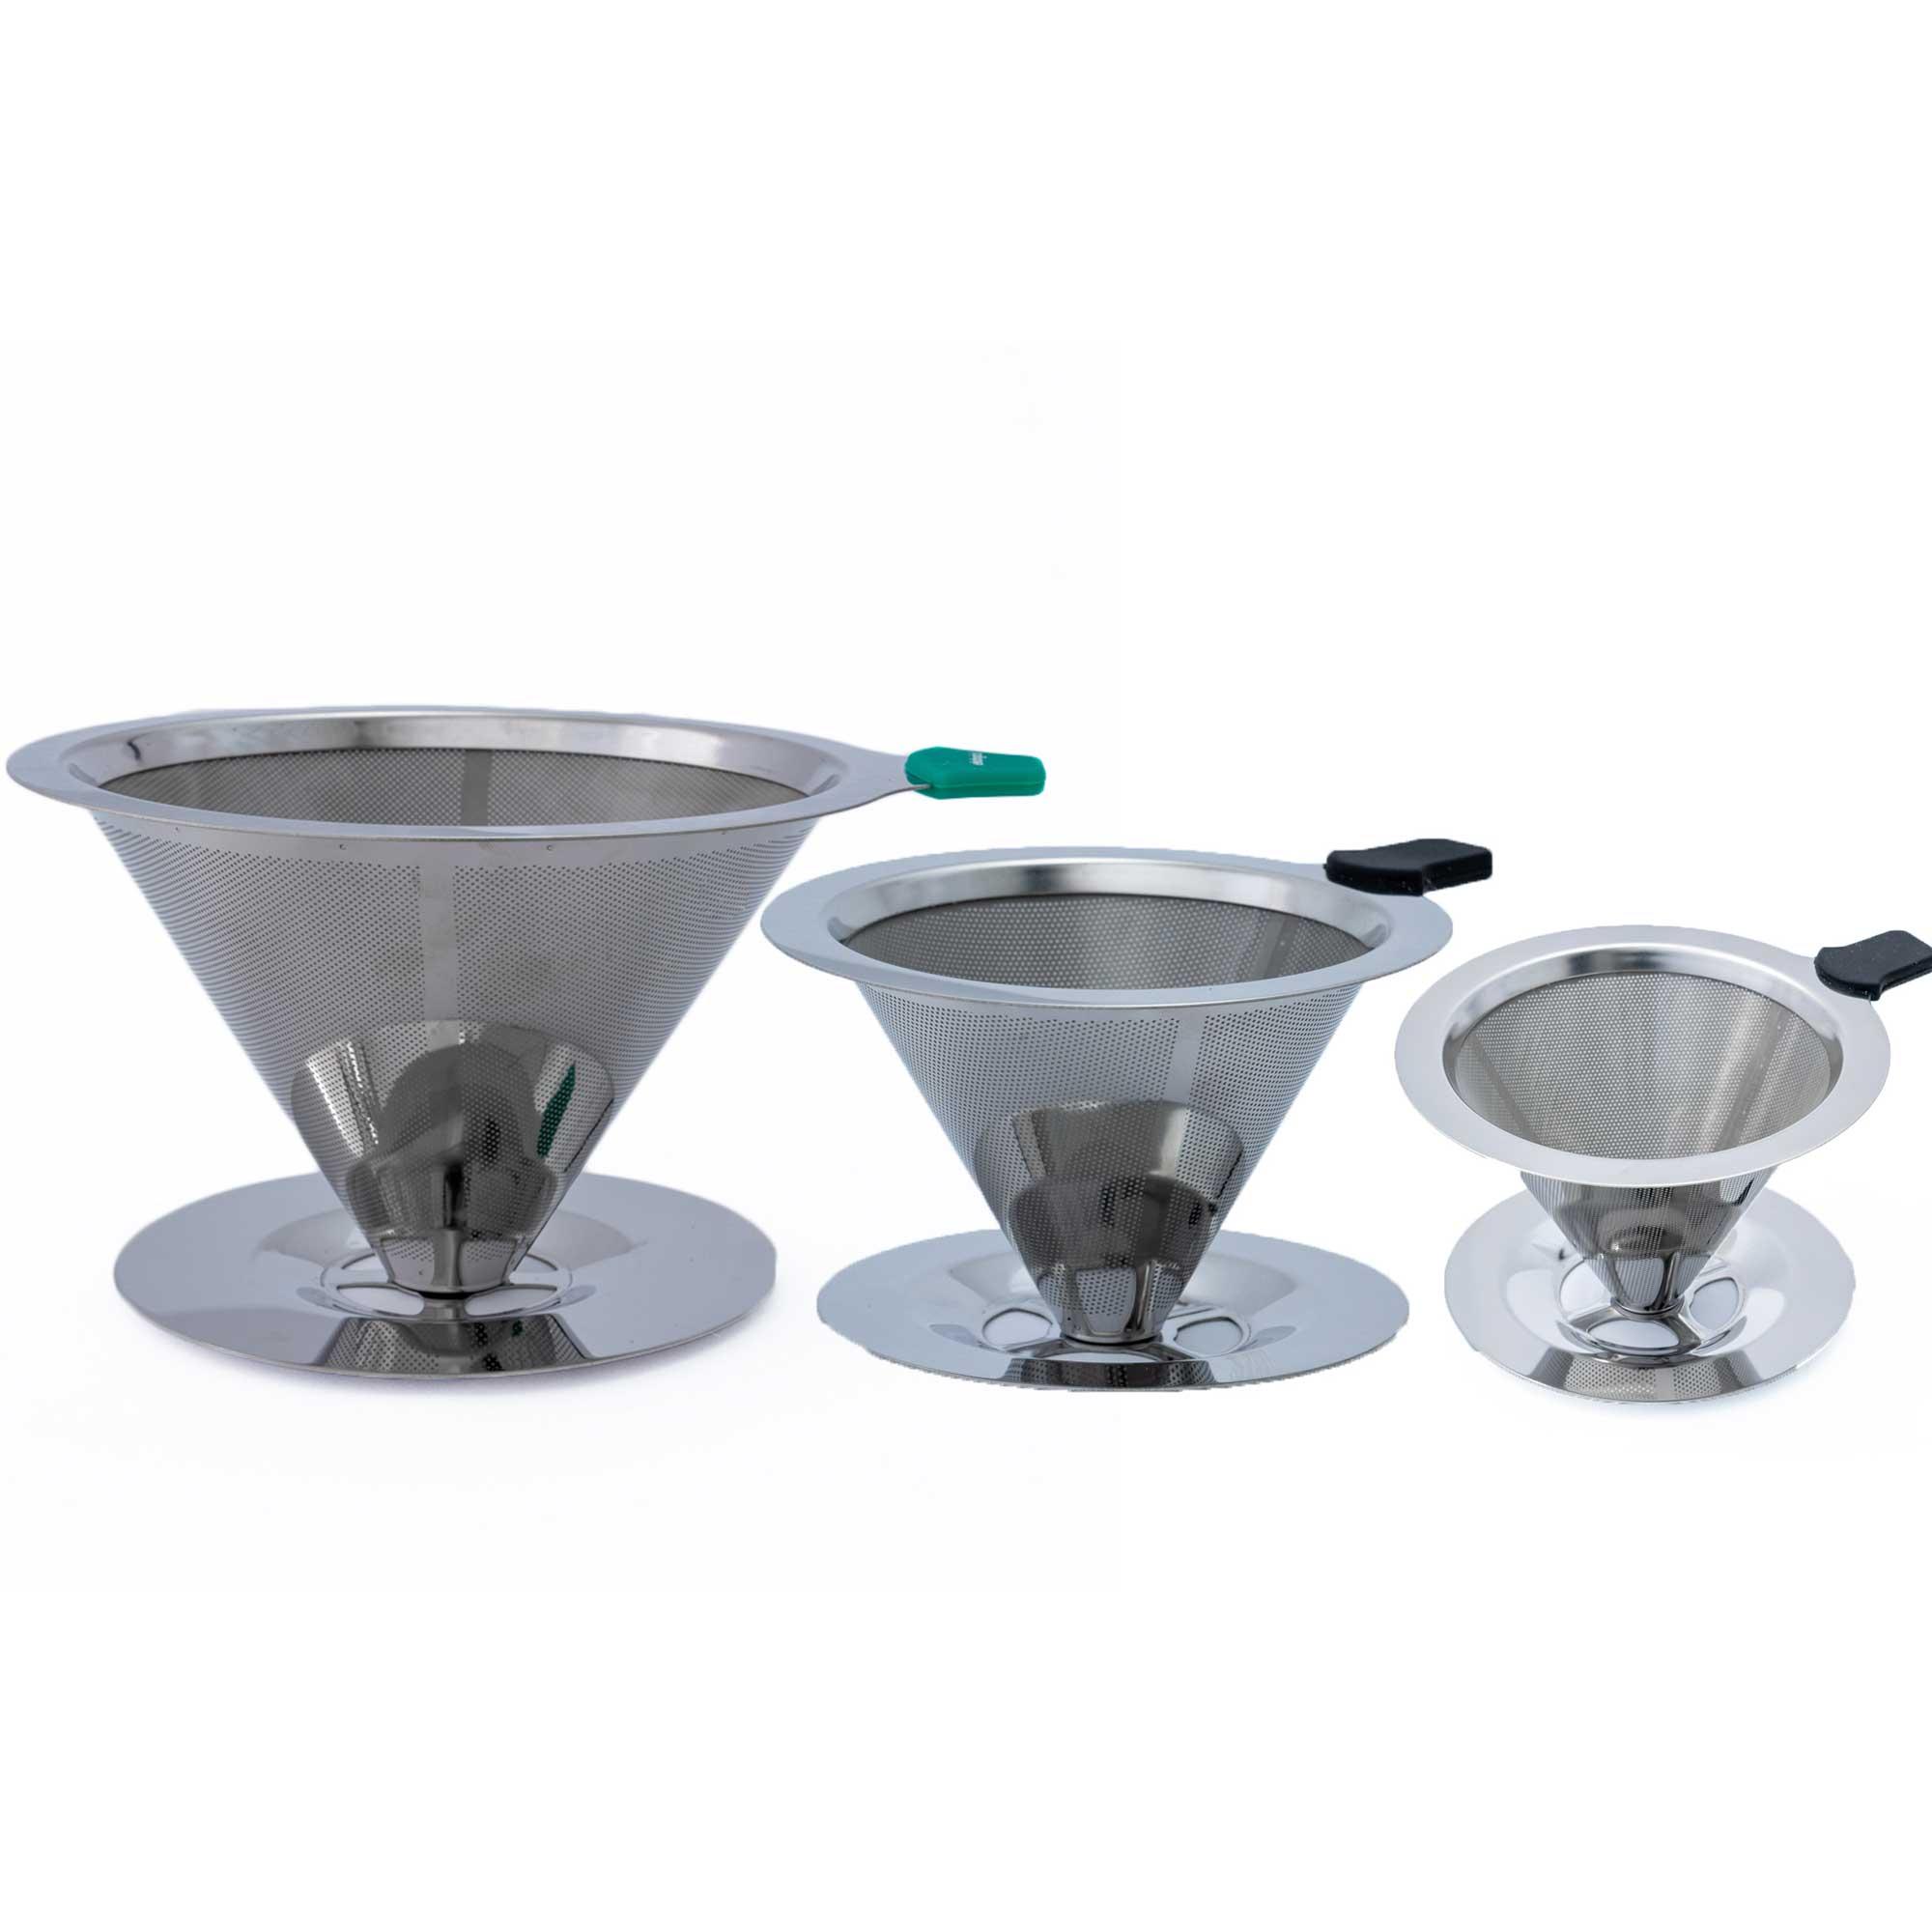 Kit Filtros Coador de Aço Inox